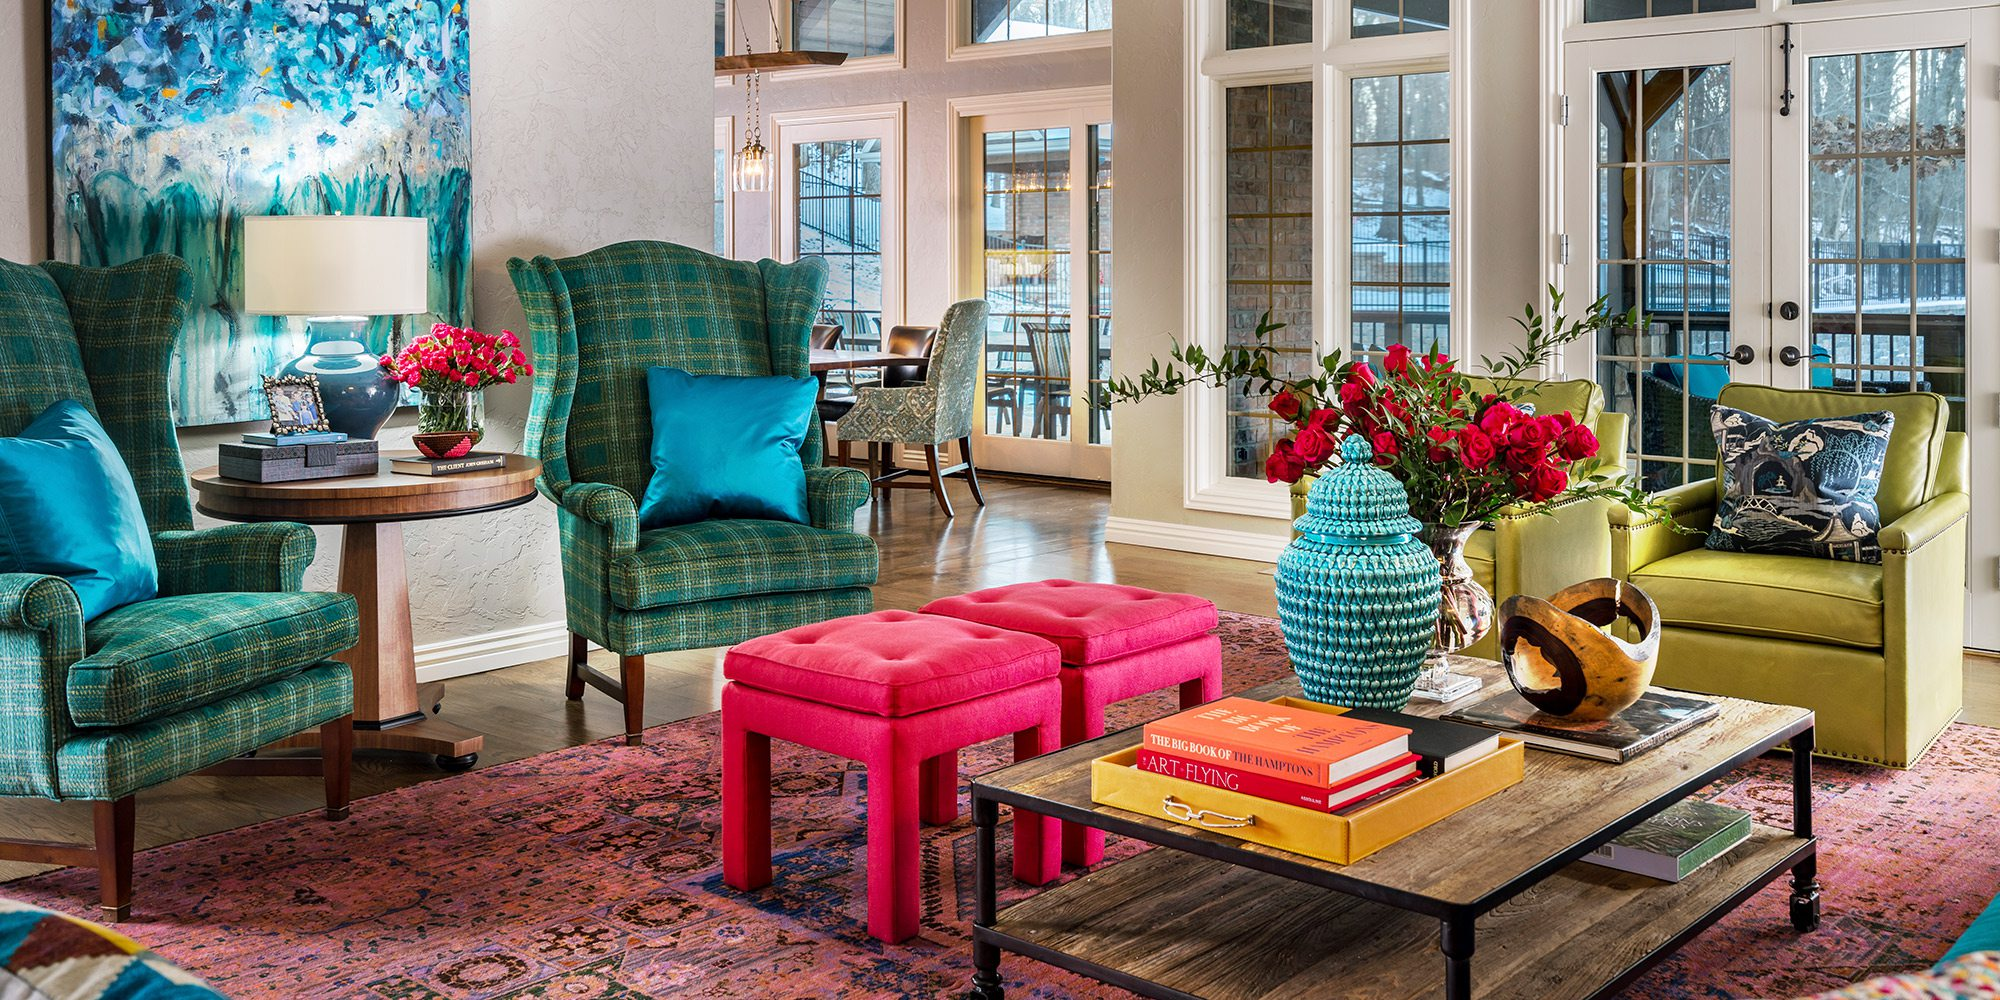 417 Home S 2019 Interior Design Award Winners